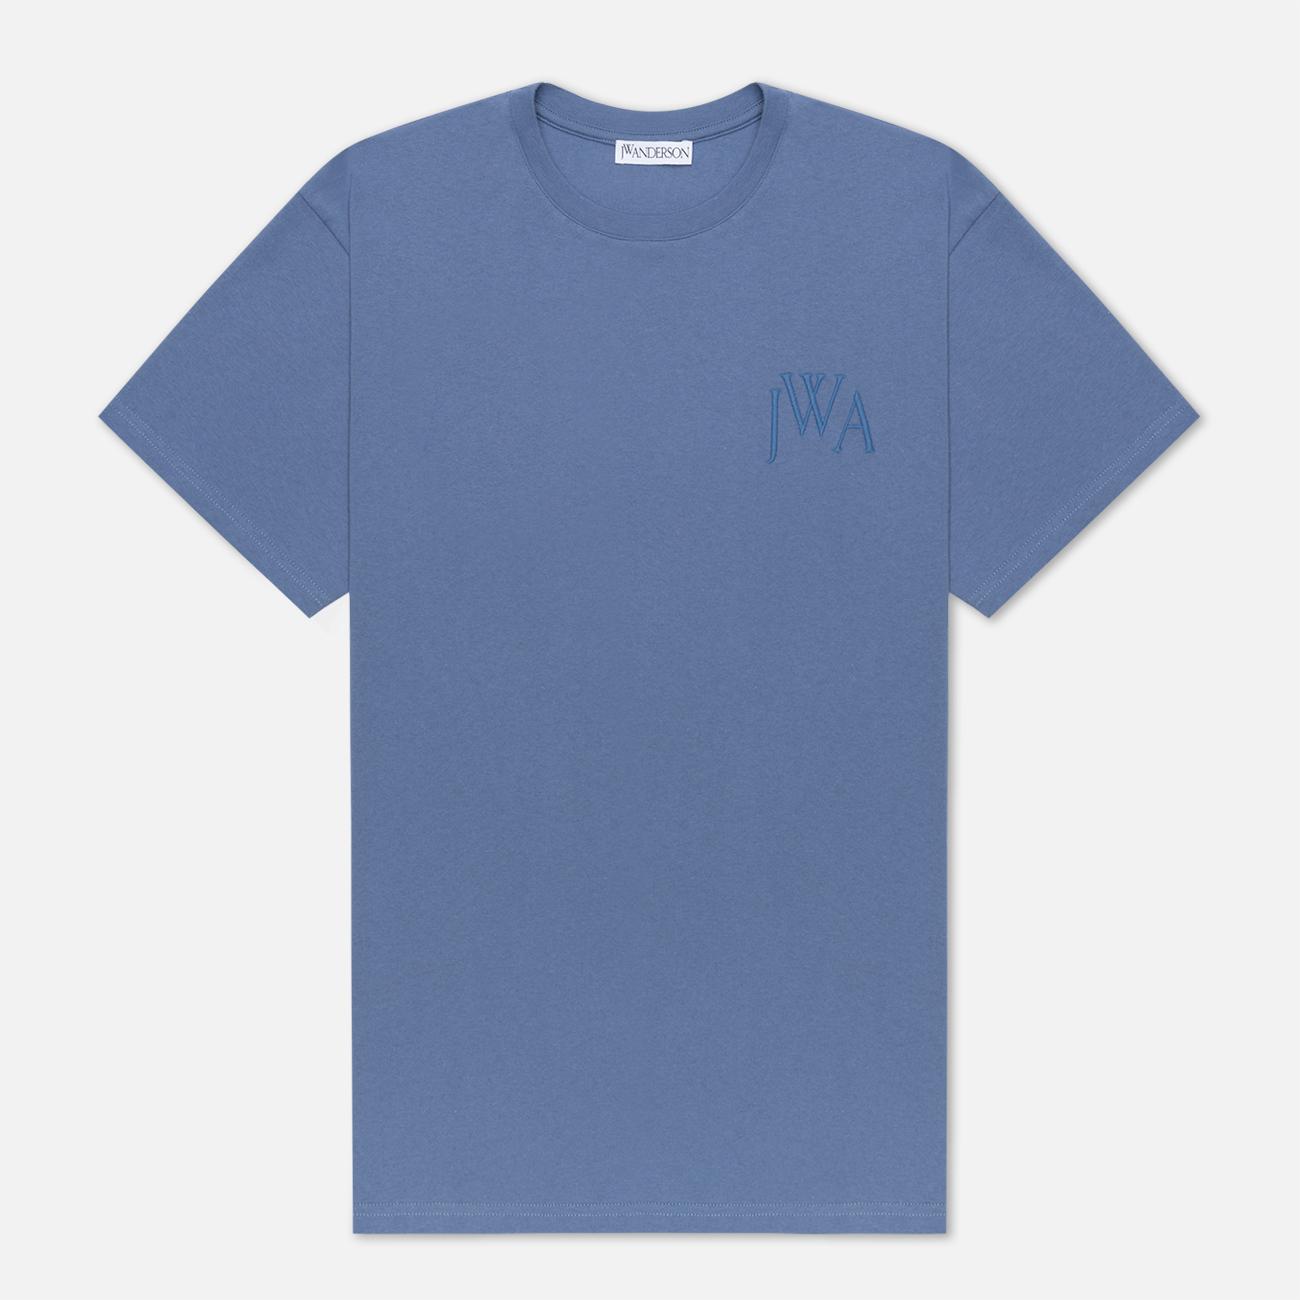 Мужская футболка JW Anderson JWA Logo Embroidery Denim Blue